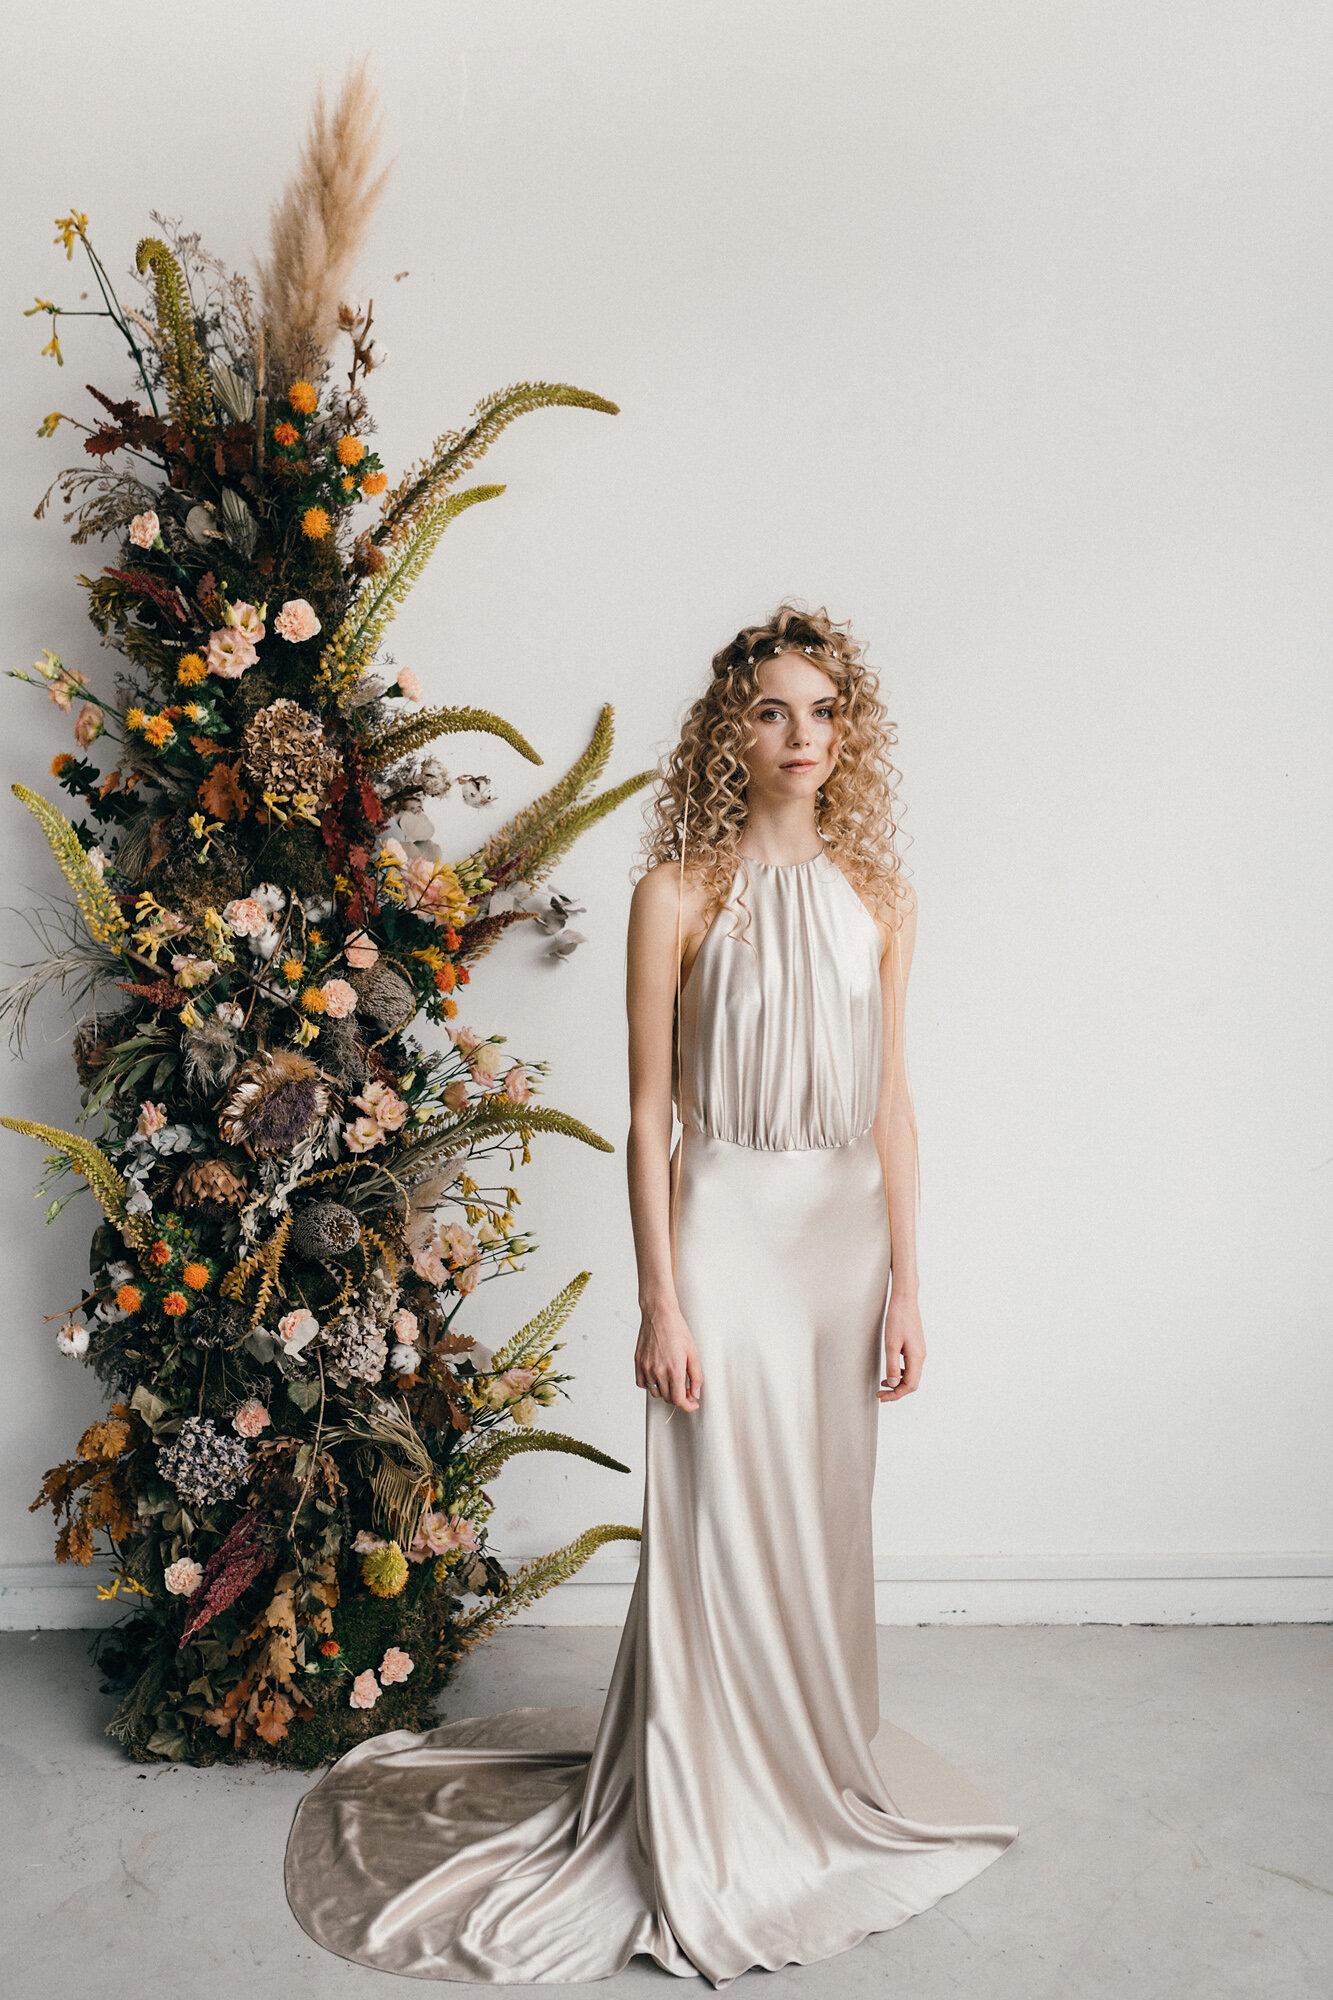 Debbie-Carlisle-Bridal-Accessories-Kate-Beaumont-Wedding-Gowns-Sheffield-Yorkshire-UK-2.jpg